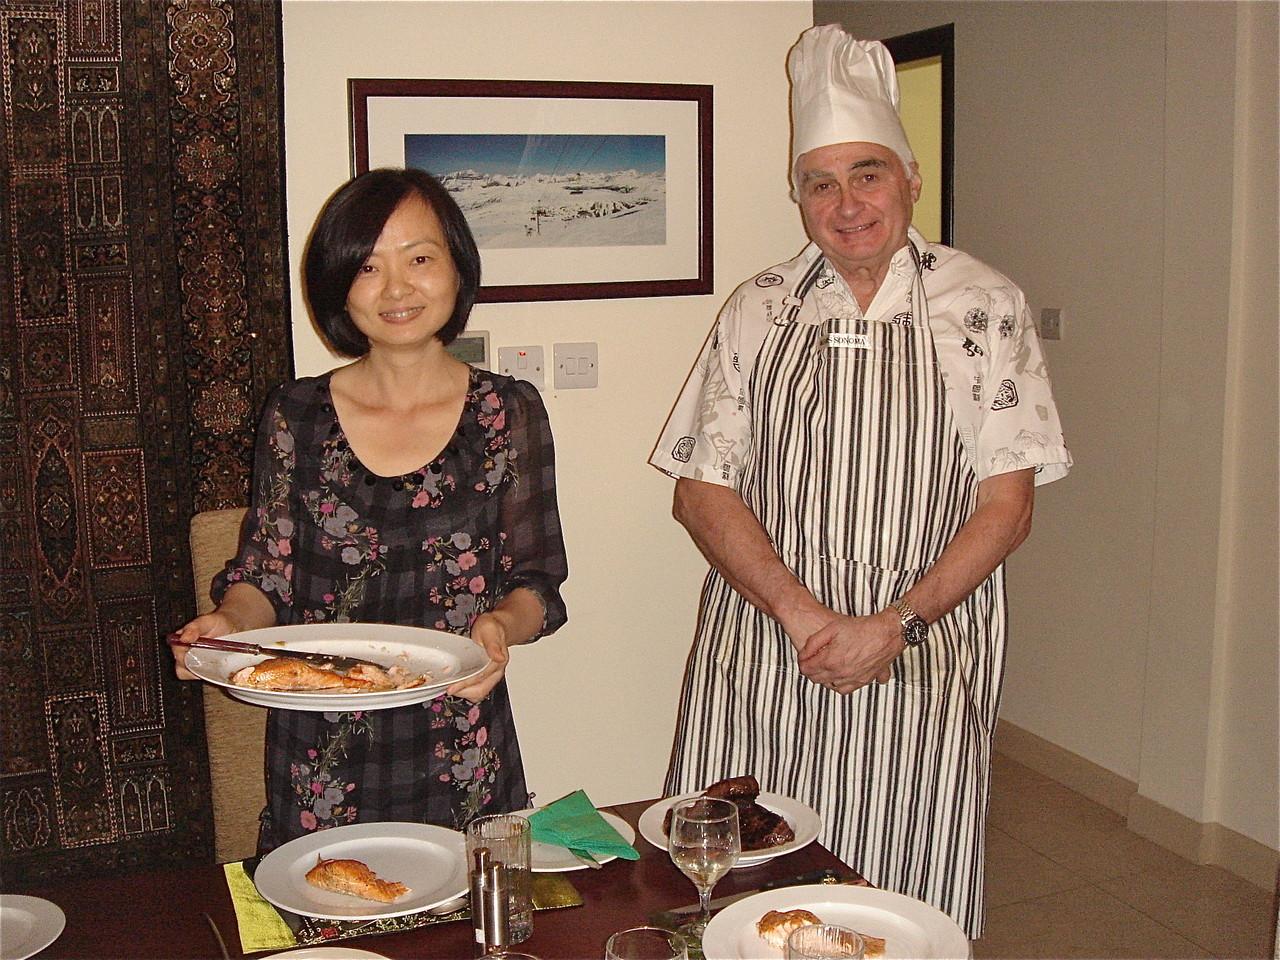 Hong Ding & Chris Triggle prepare dinner